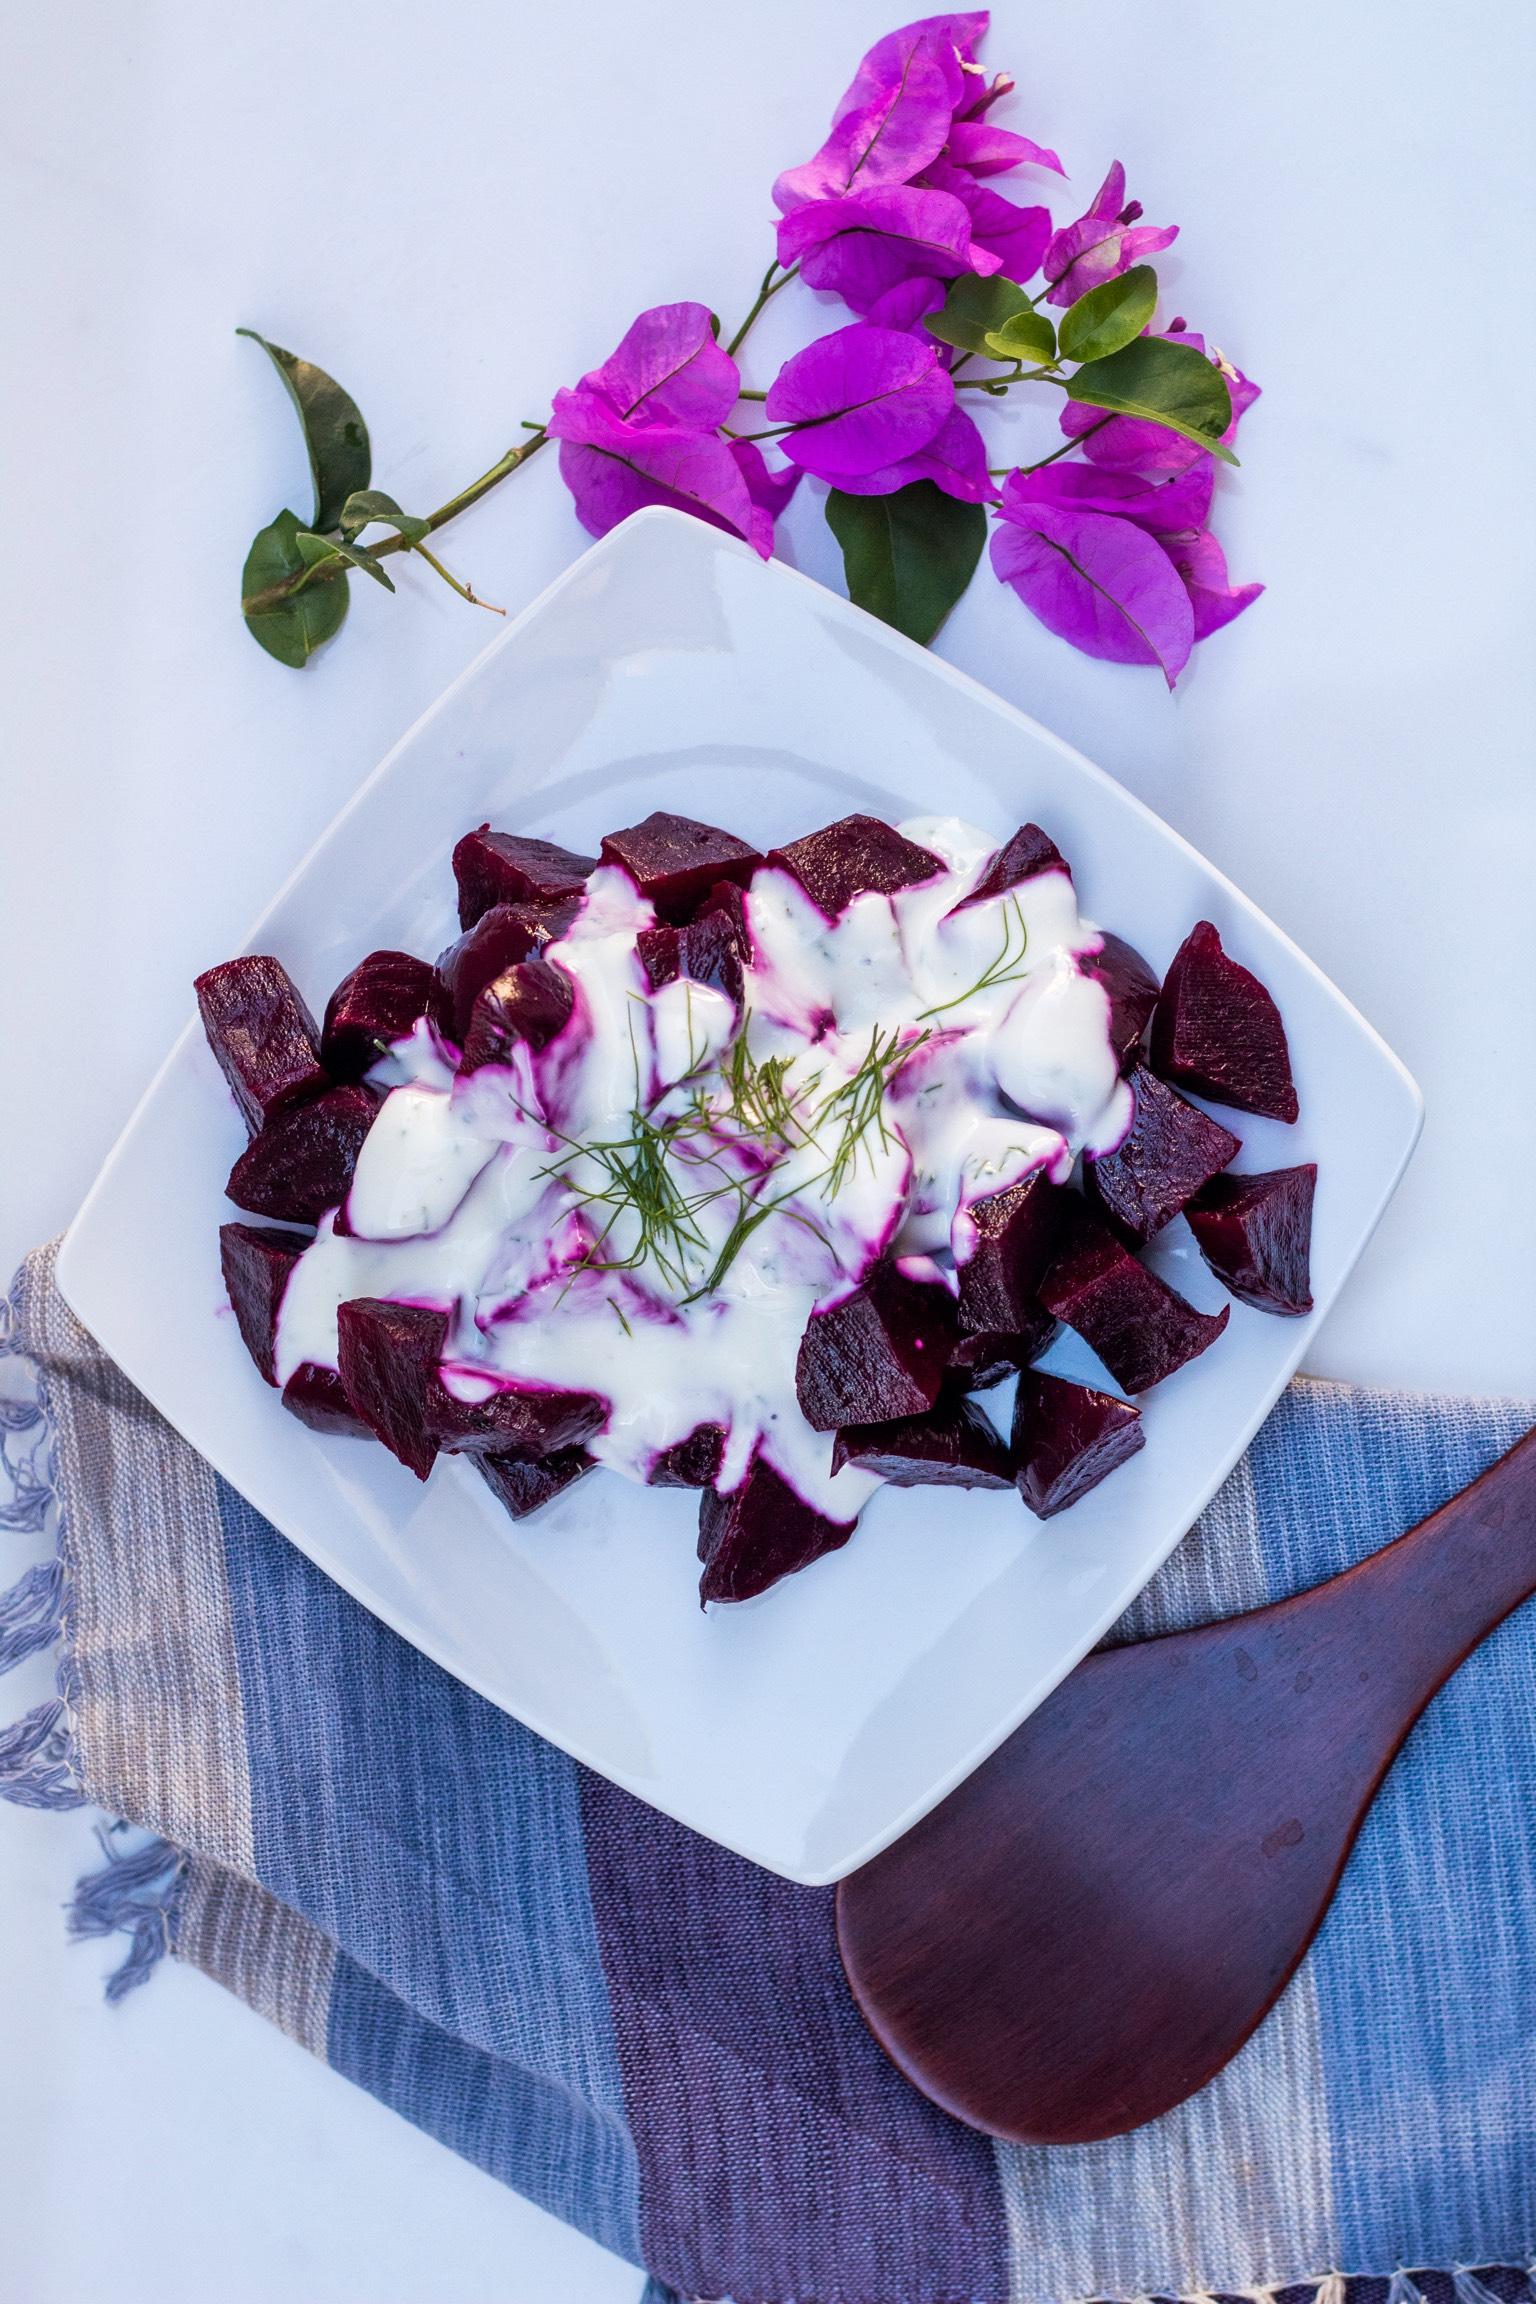 Greek beets